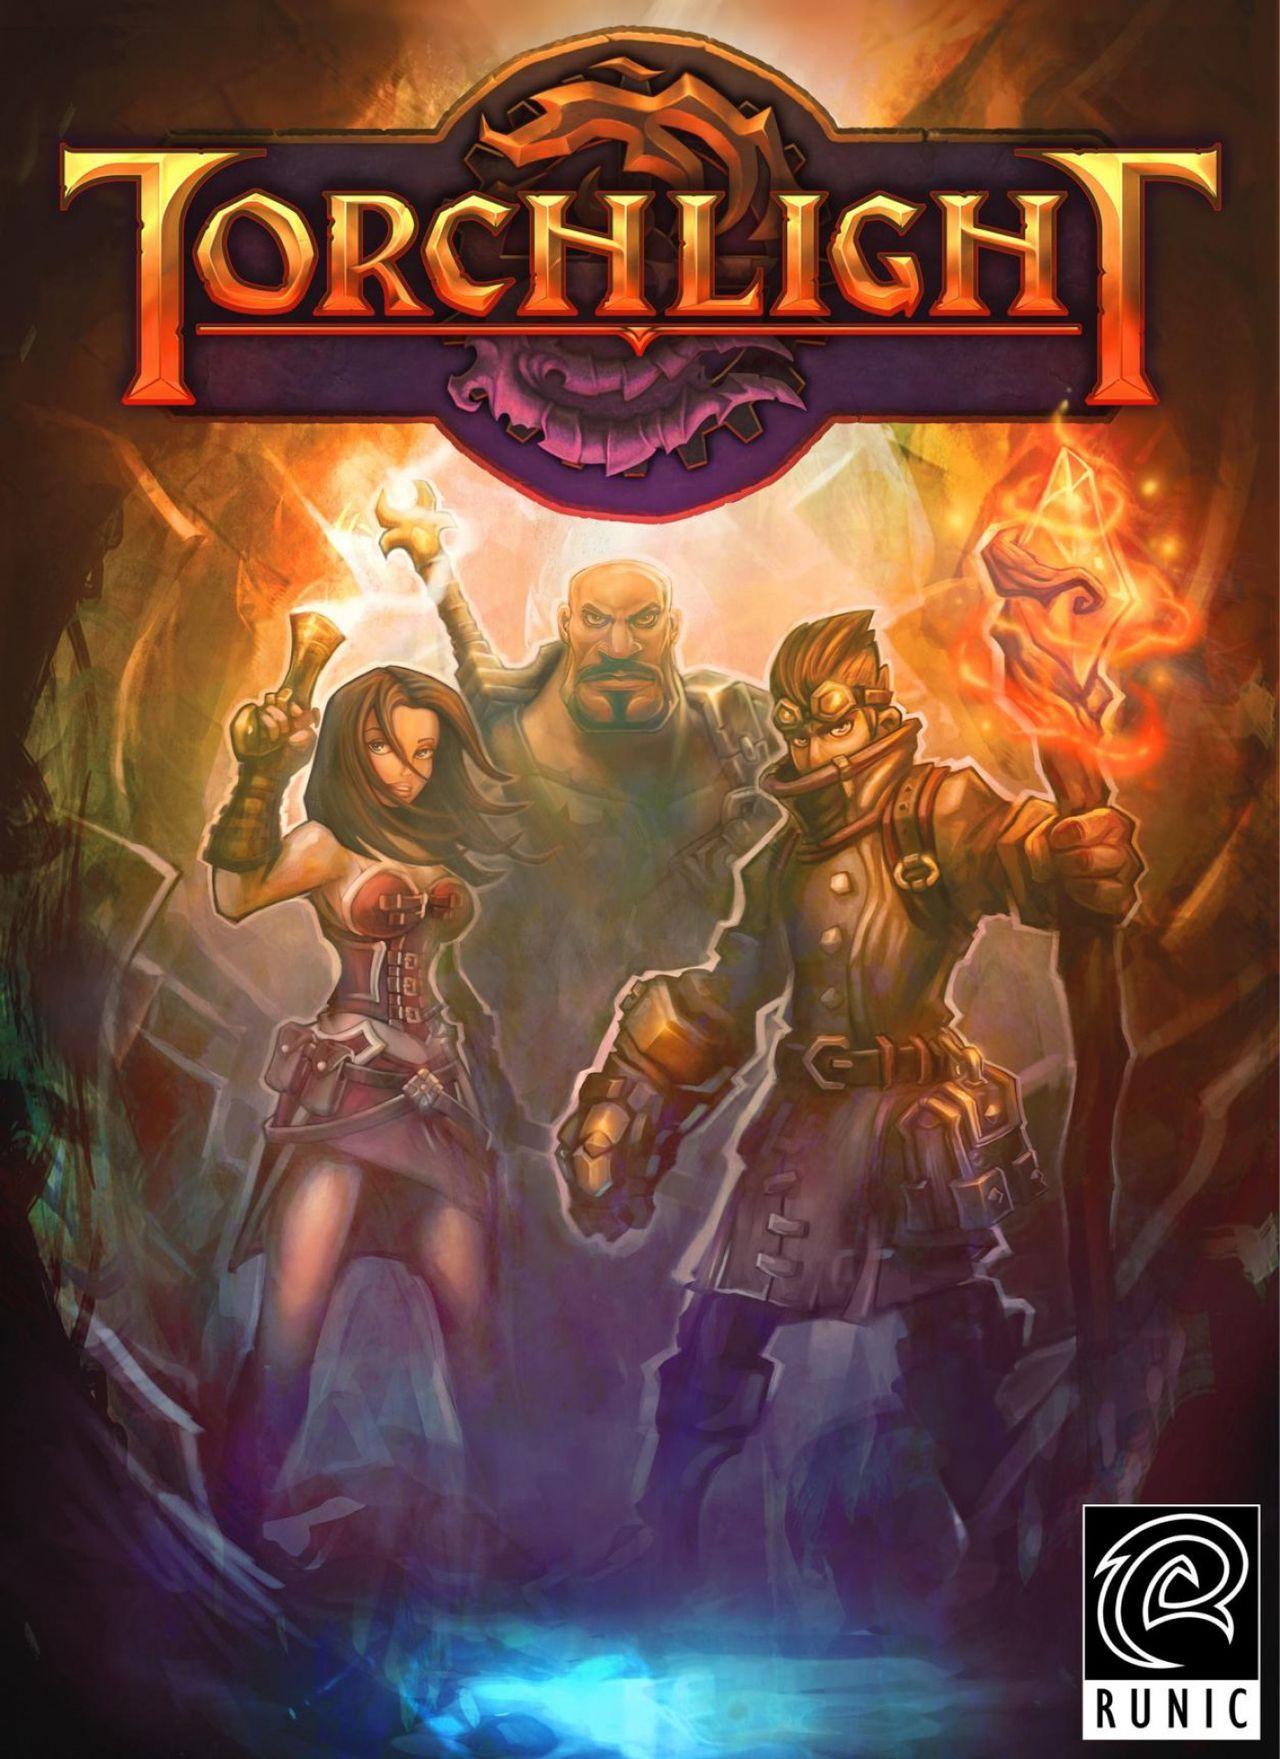 Trucos Torchlight - PC - Claves, Guías